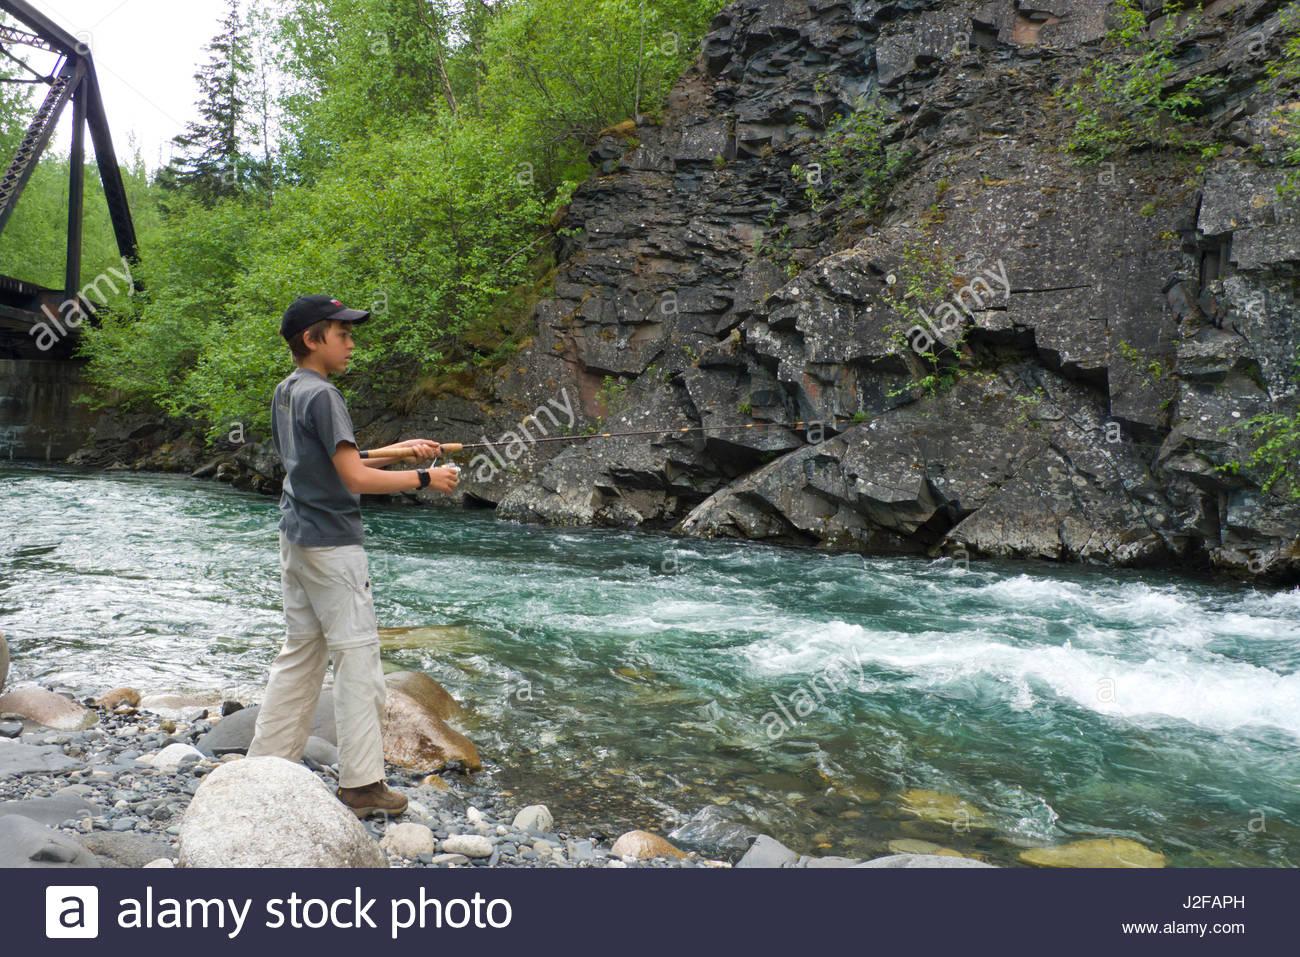 Alaska matanuska susitna county talkeetna - Stock Photo Young Teenage Boy Fishing In The Swift Flowing Indian River Talkeetna Mountains Matanuska Susitna Borough Alaska Usa